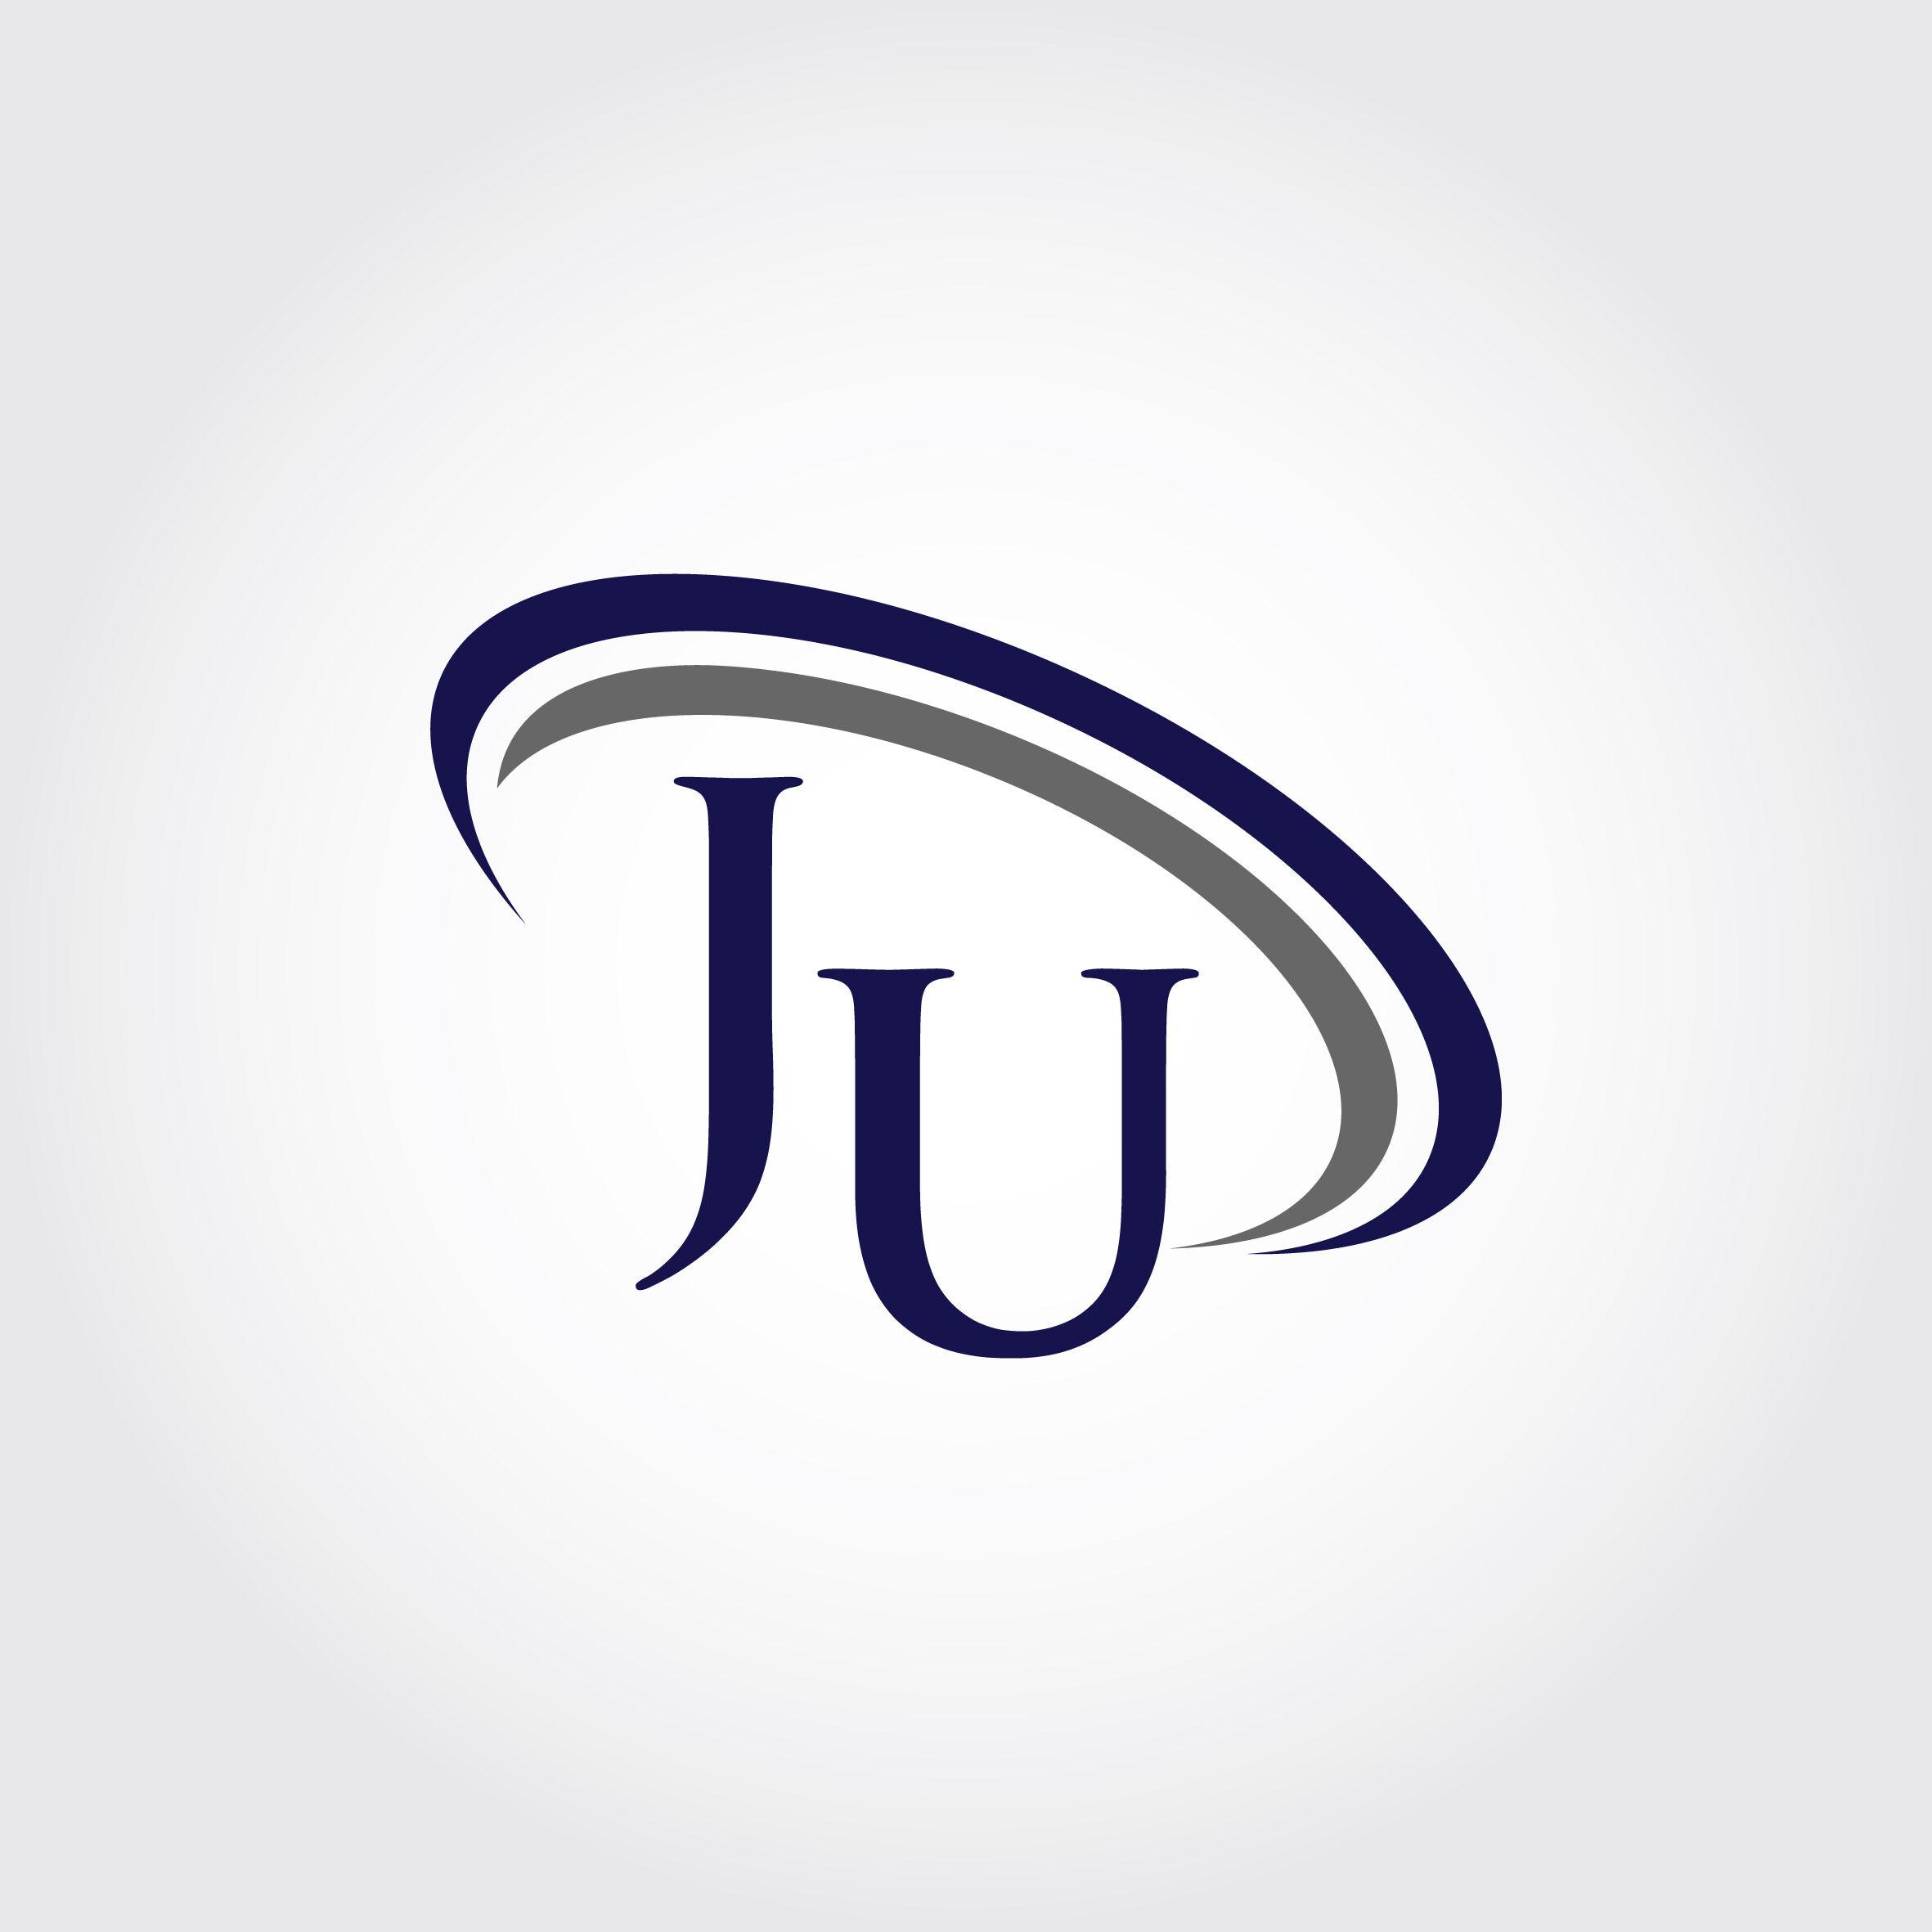 Monogram JU Logo Design By Vectorseller.